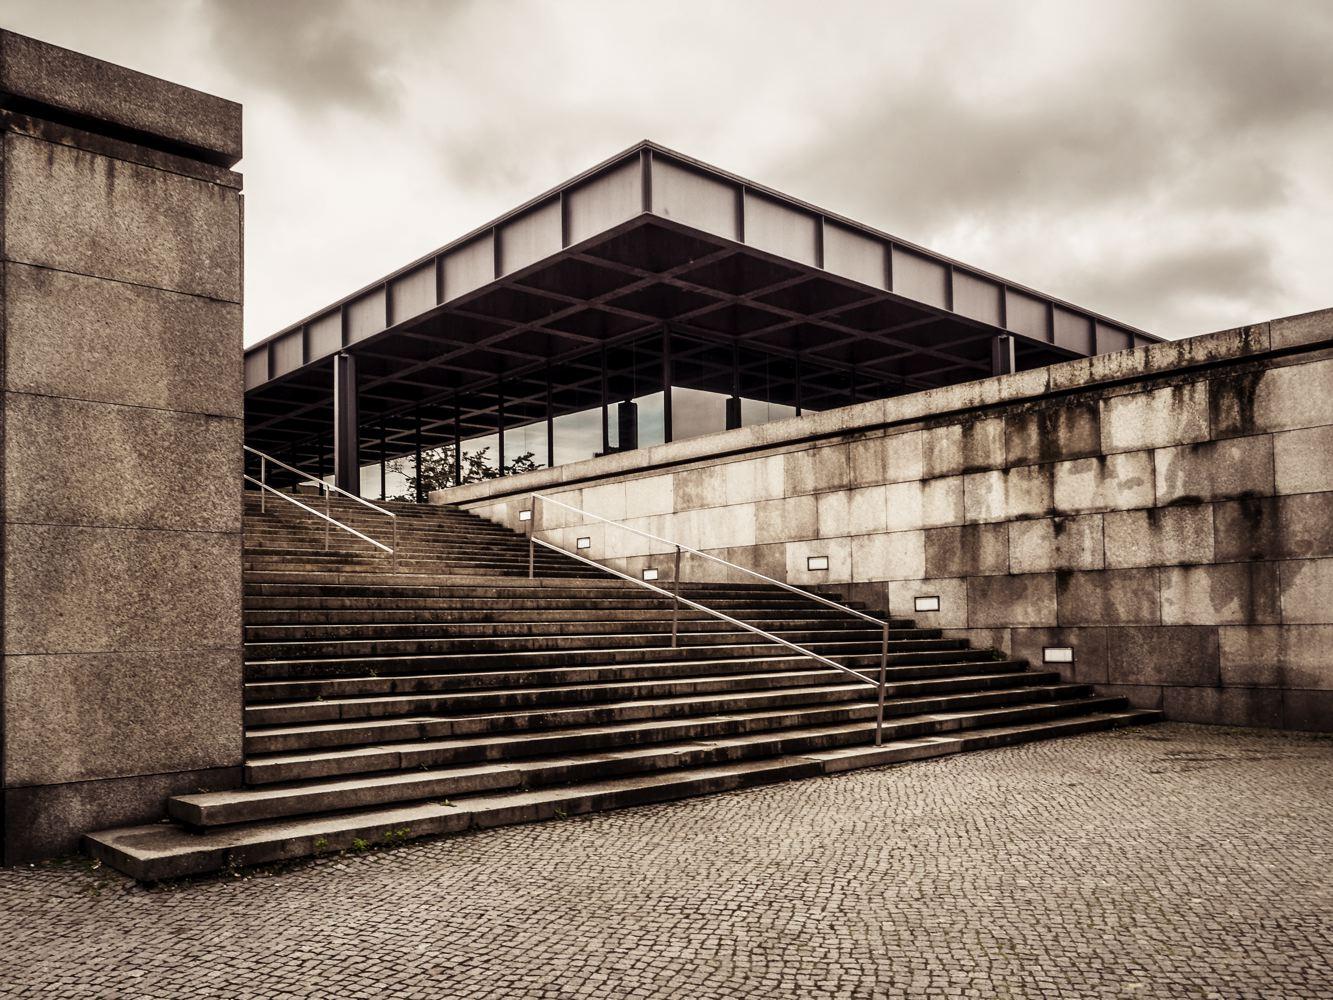 LDKphoto_BERLIN - Neue Nationalgalerie-014.jpg